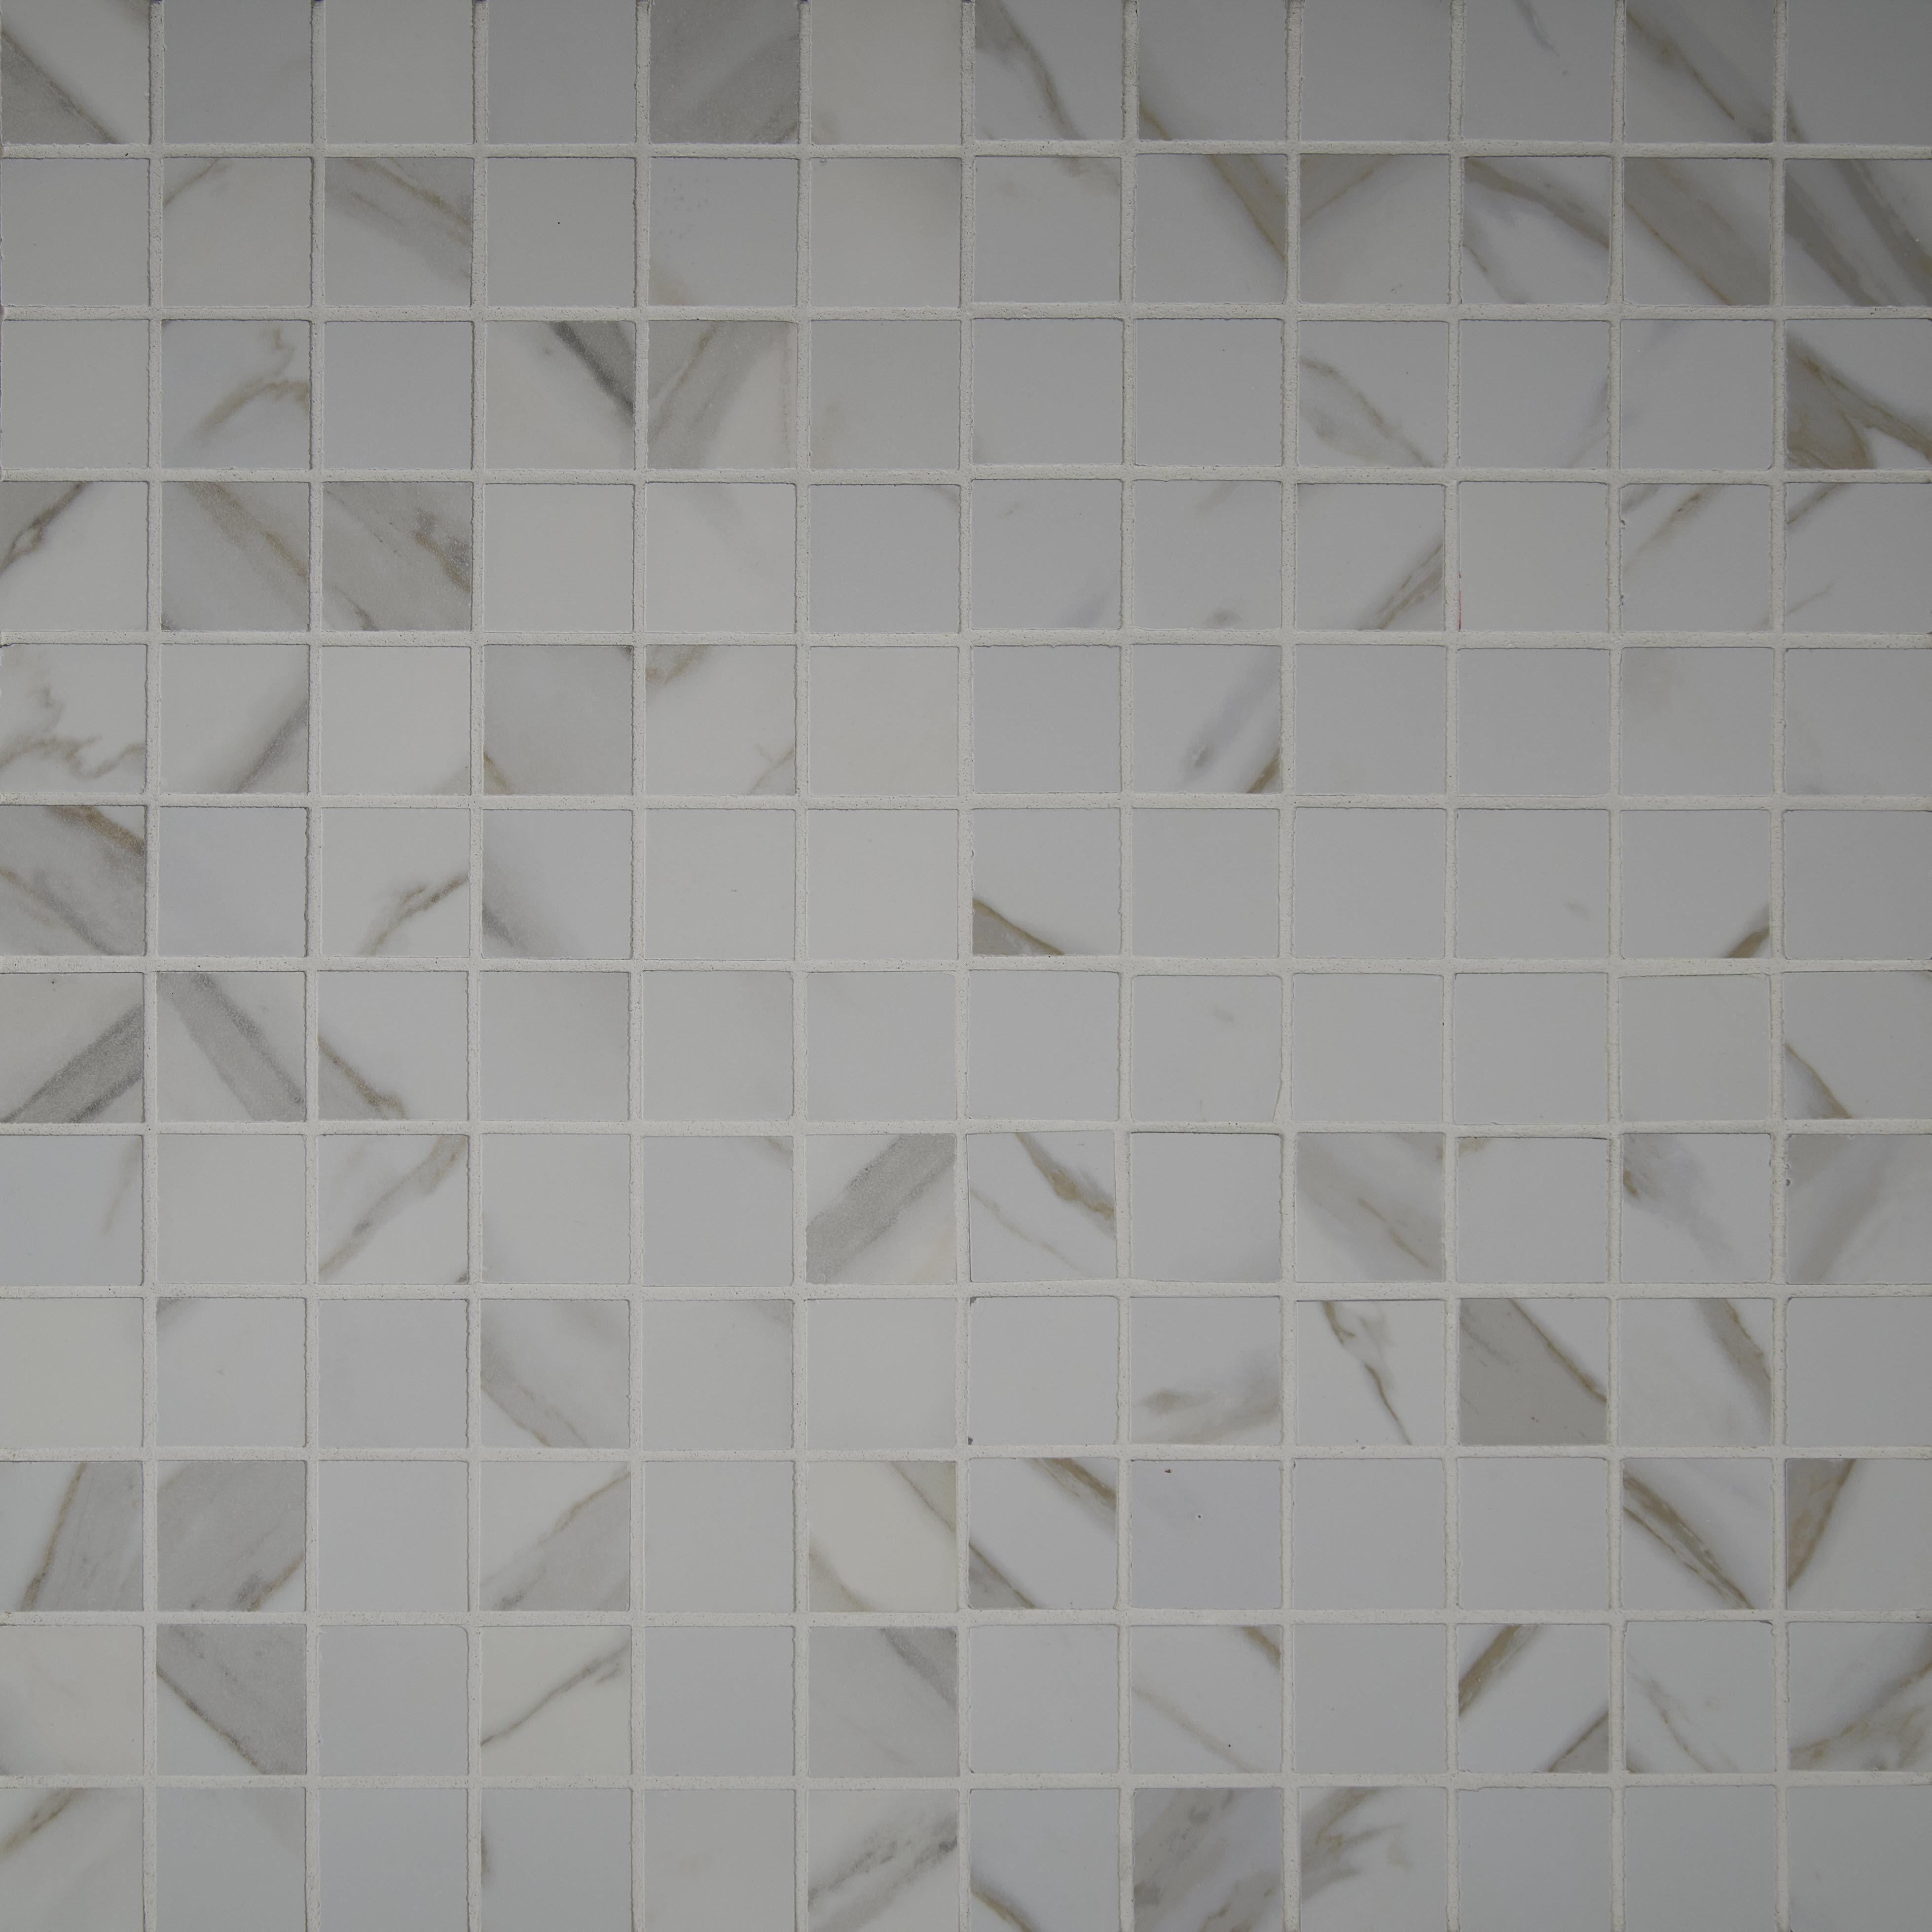 Msi Pietra Calacatta 2 X Porcelain Mosaic Tile In White Reviews Wayfair